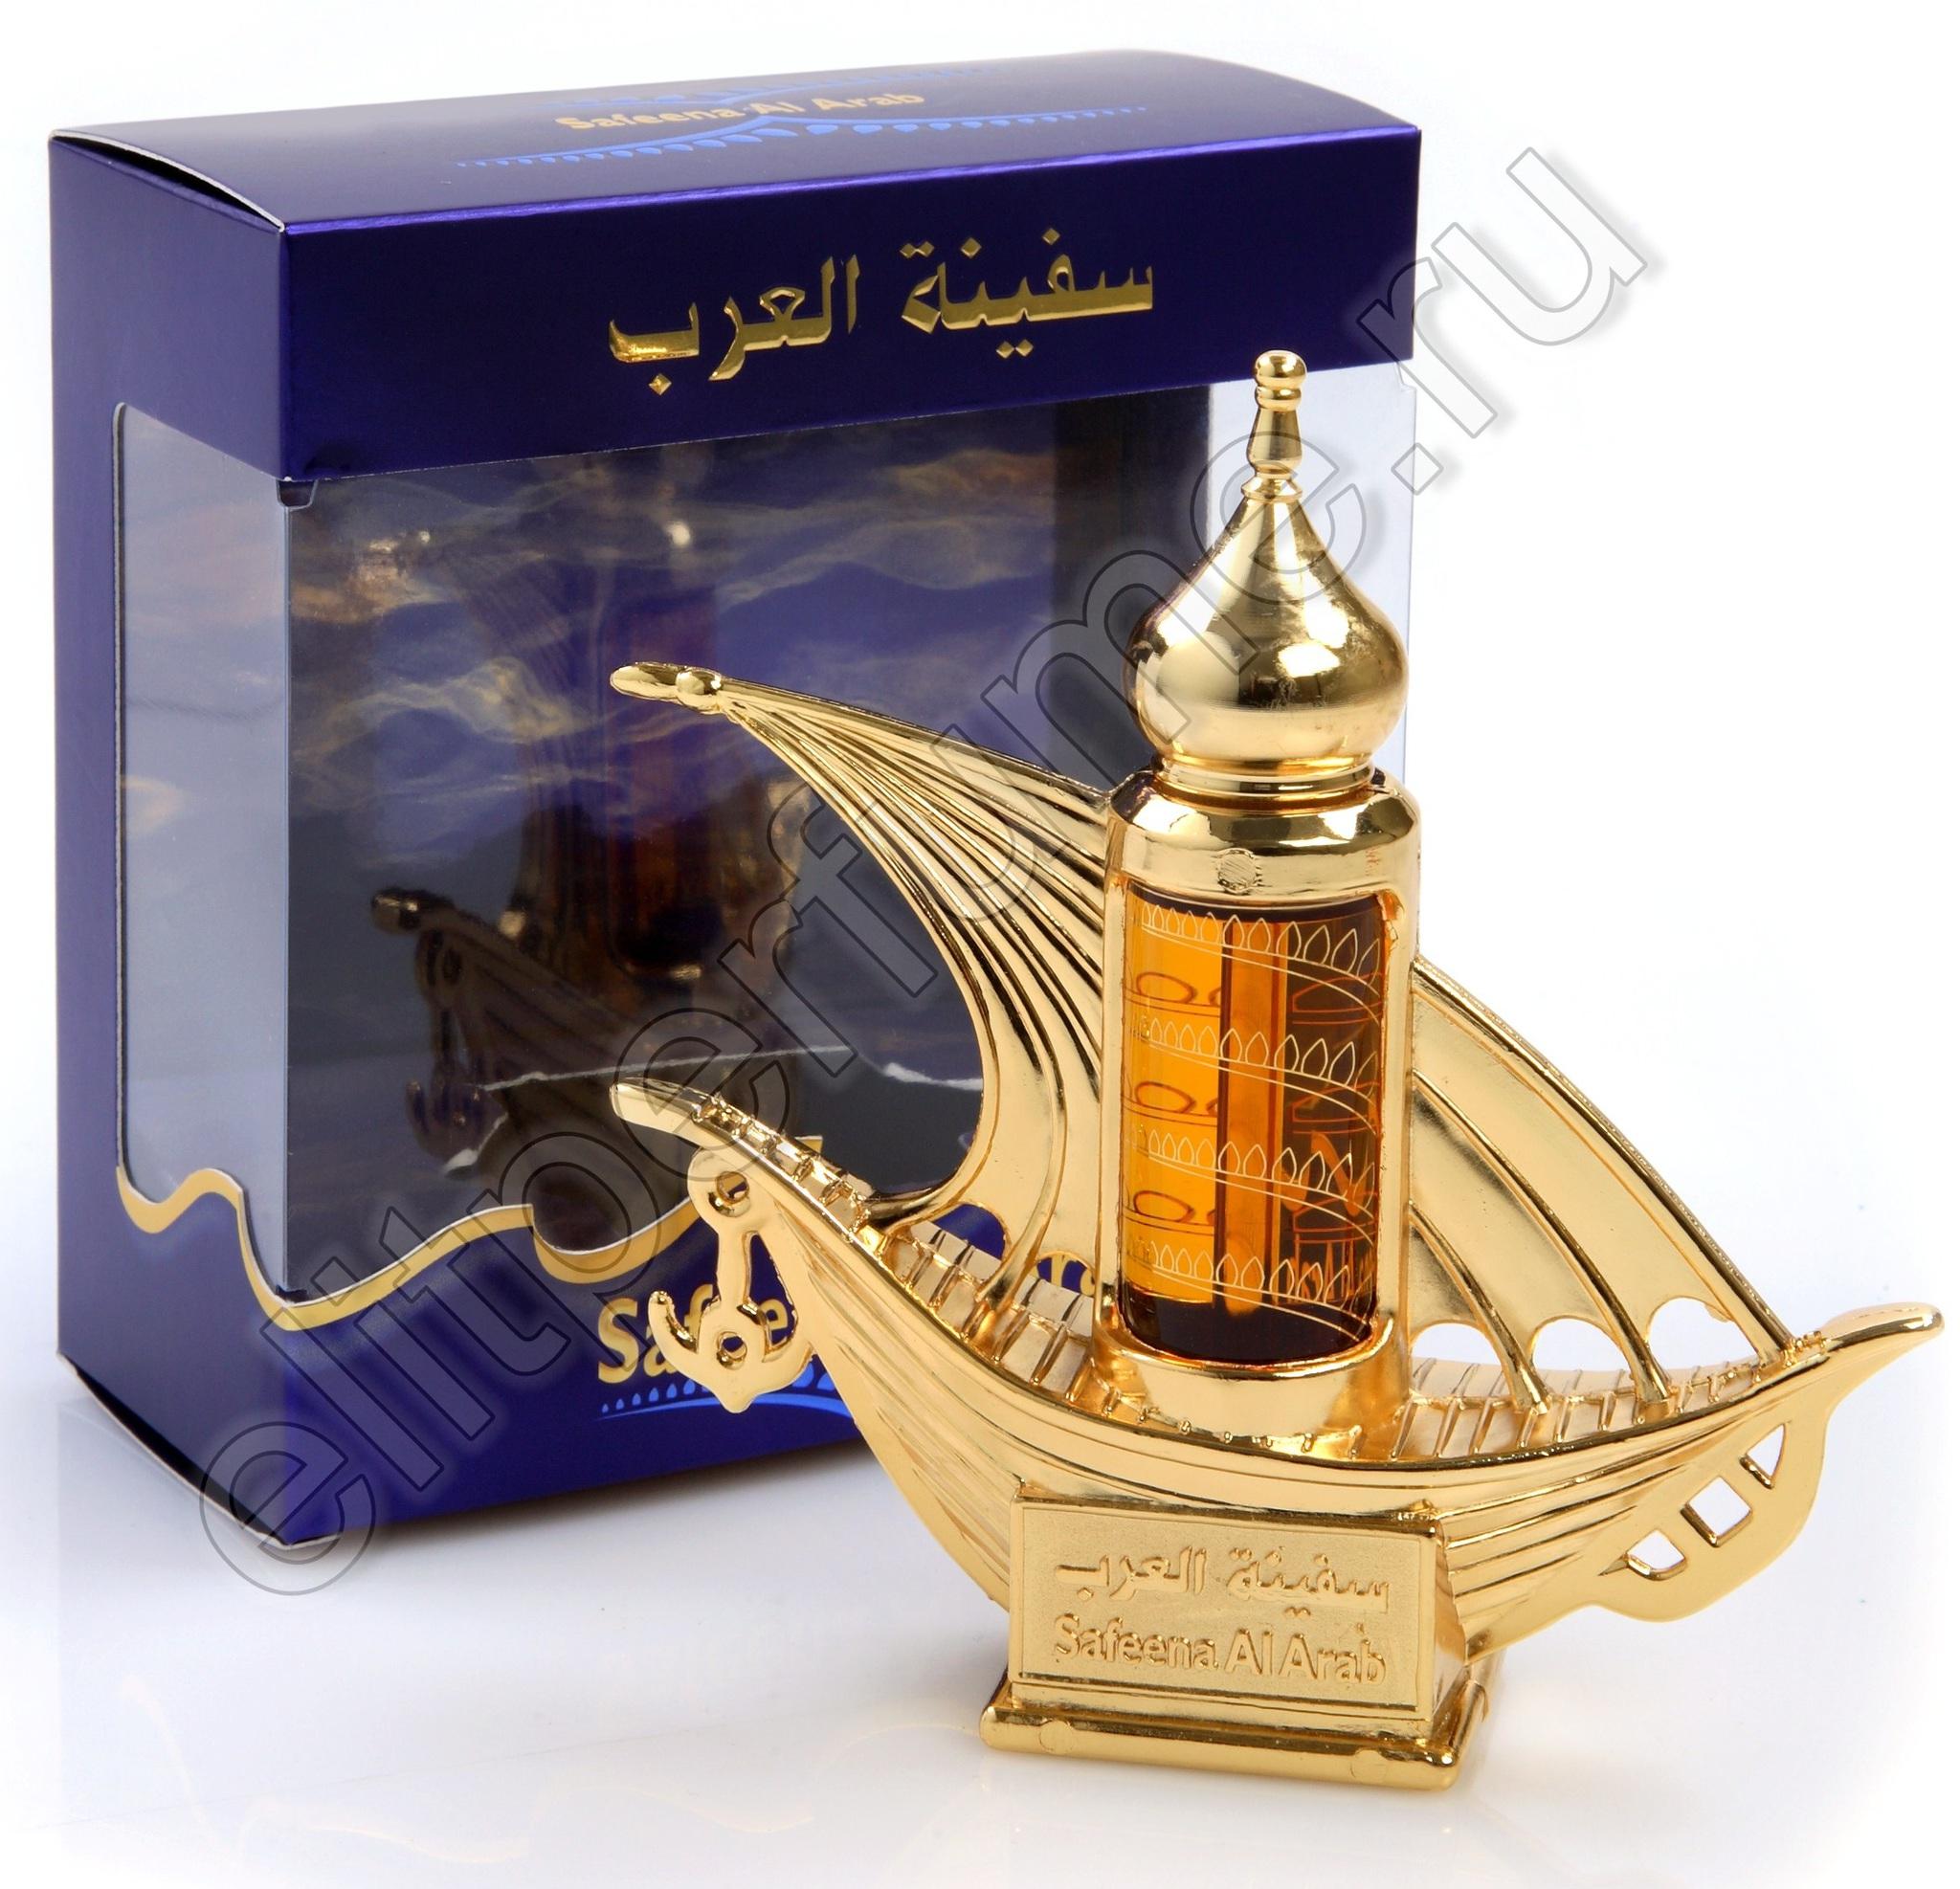 Сафина Аль Араб Safeena Al Arab 20 мл арабские масляные духи от Аль Харамайн Al Haramain Perfumes